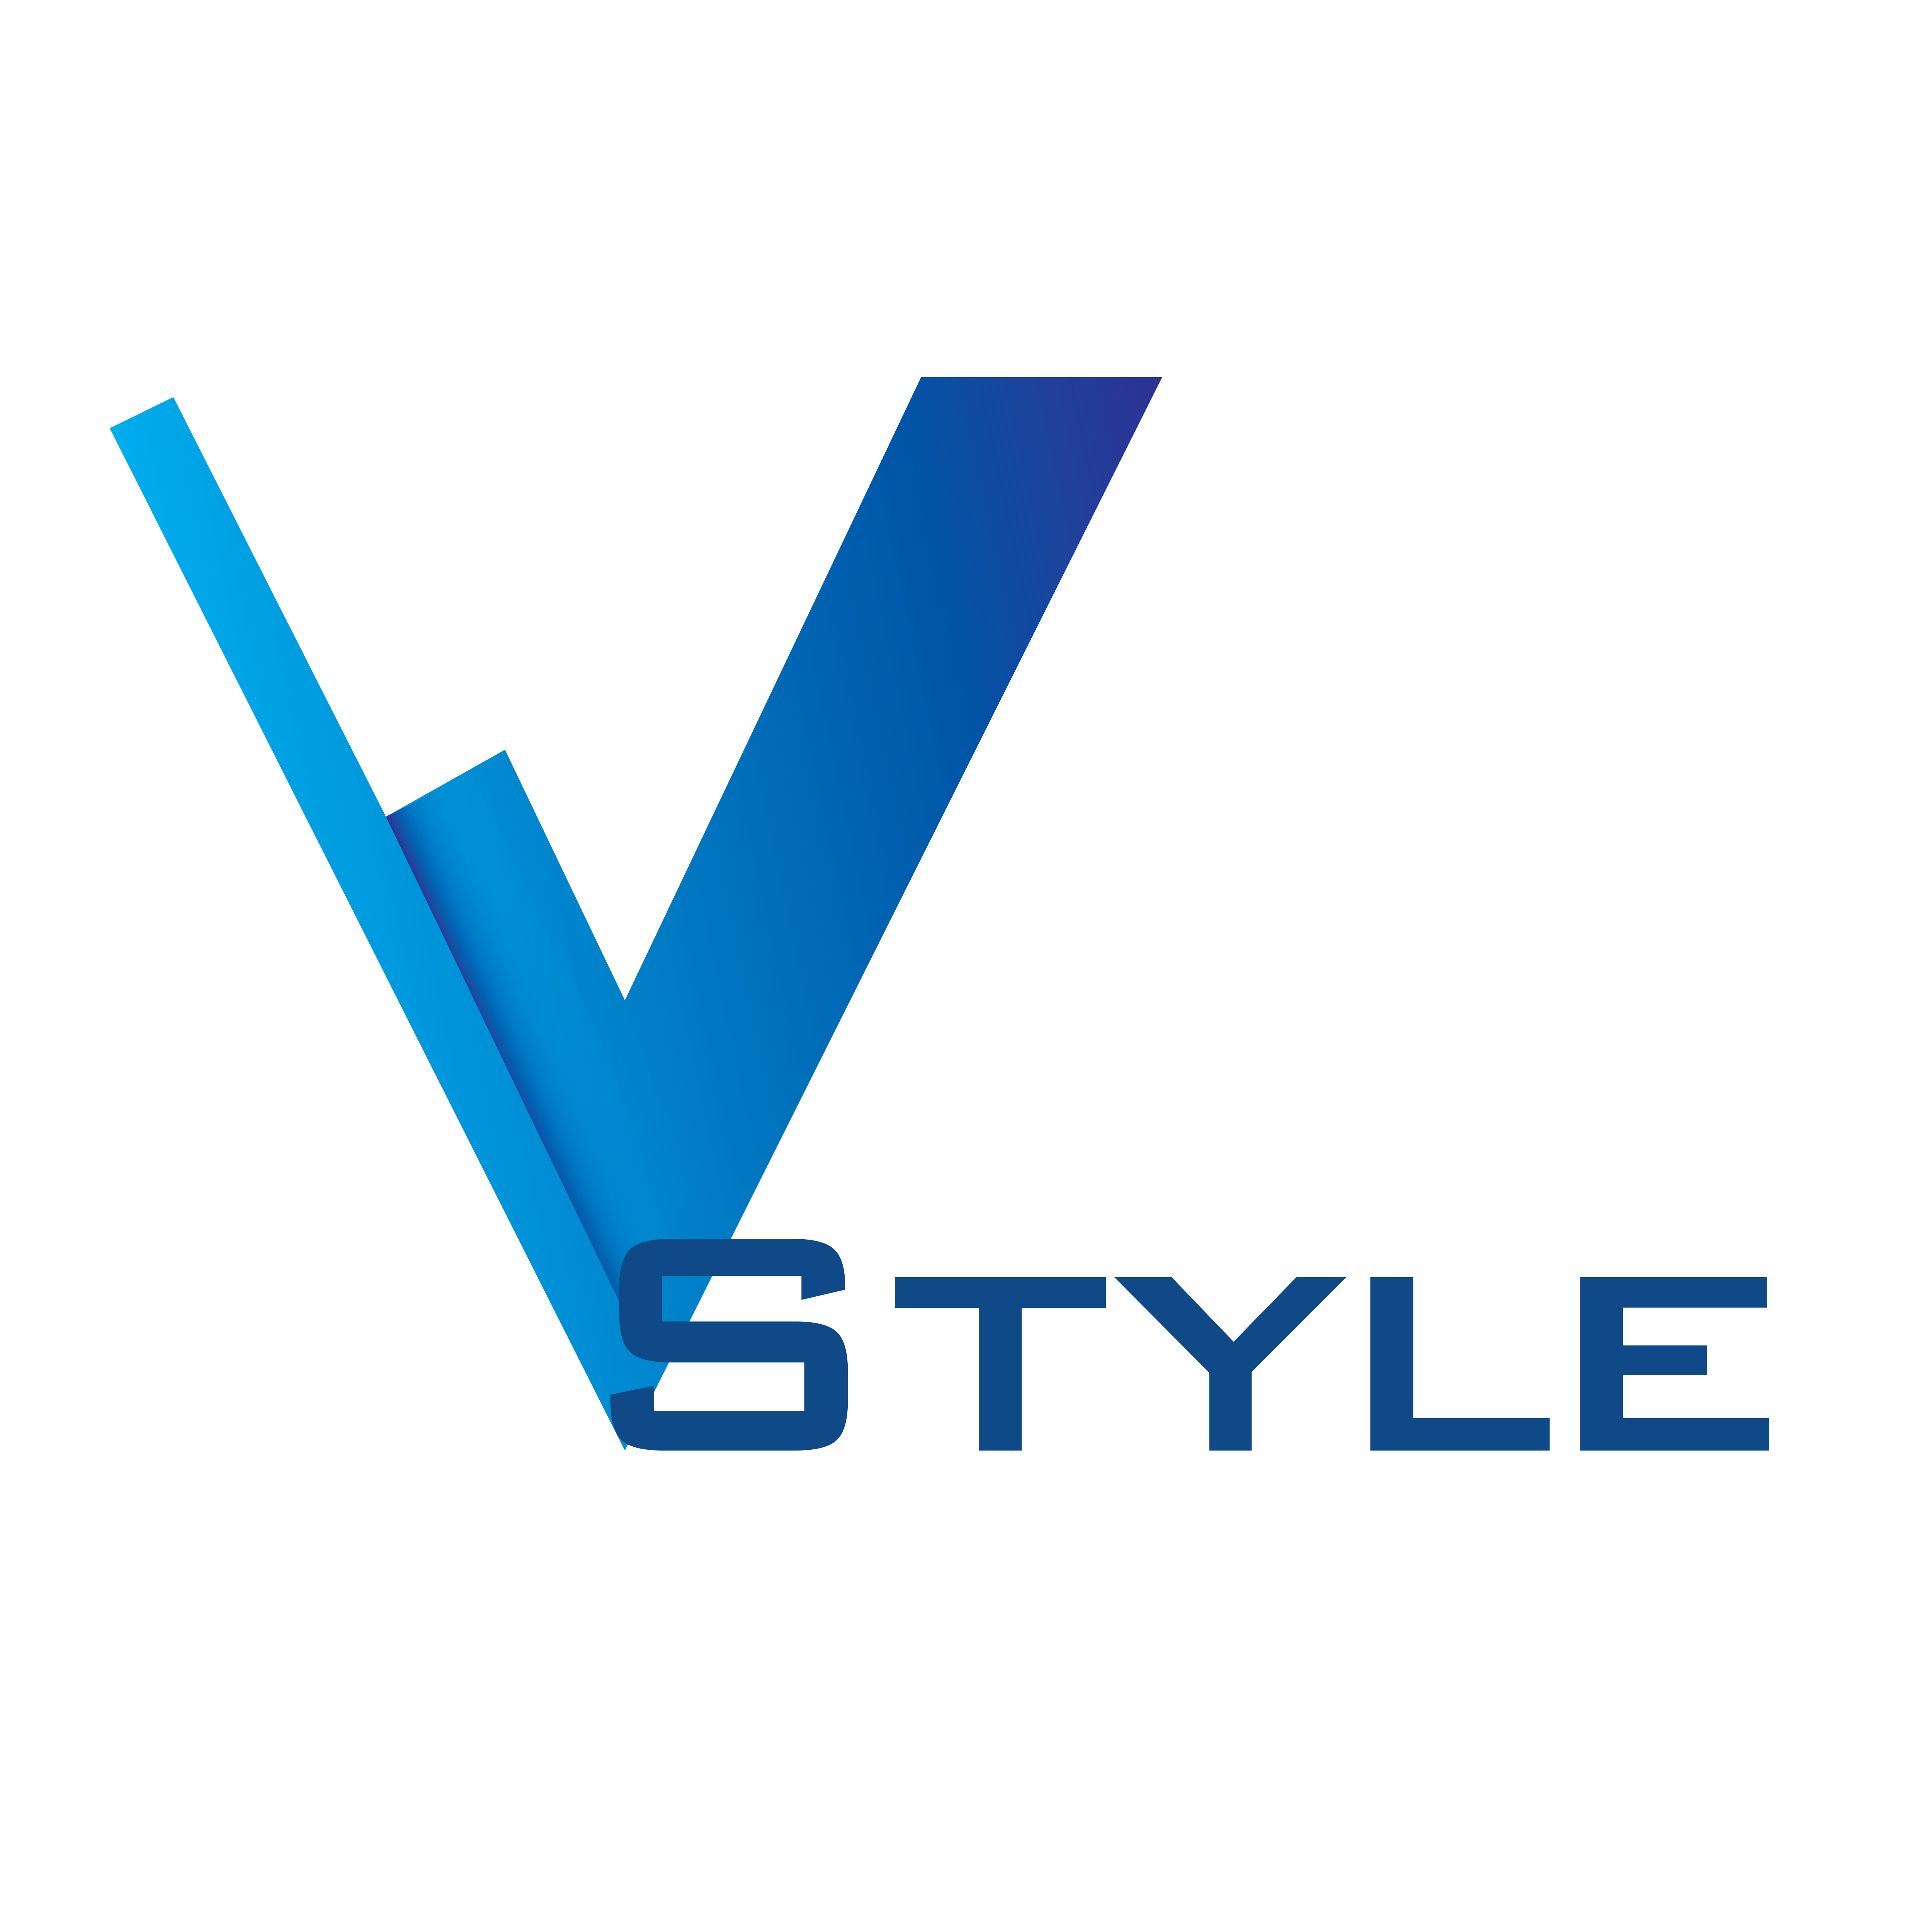 V-style Zaštitna oprema